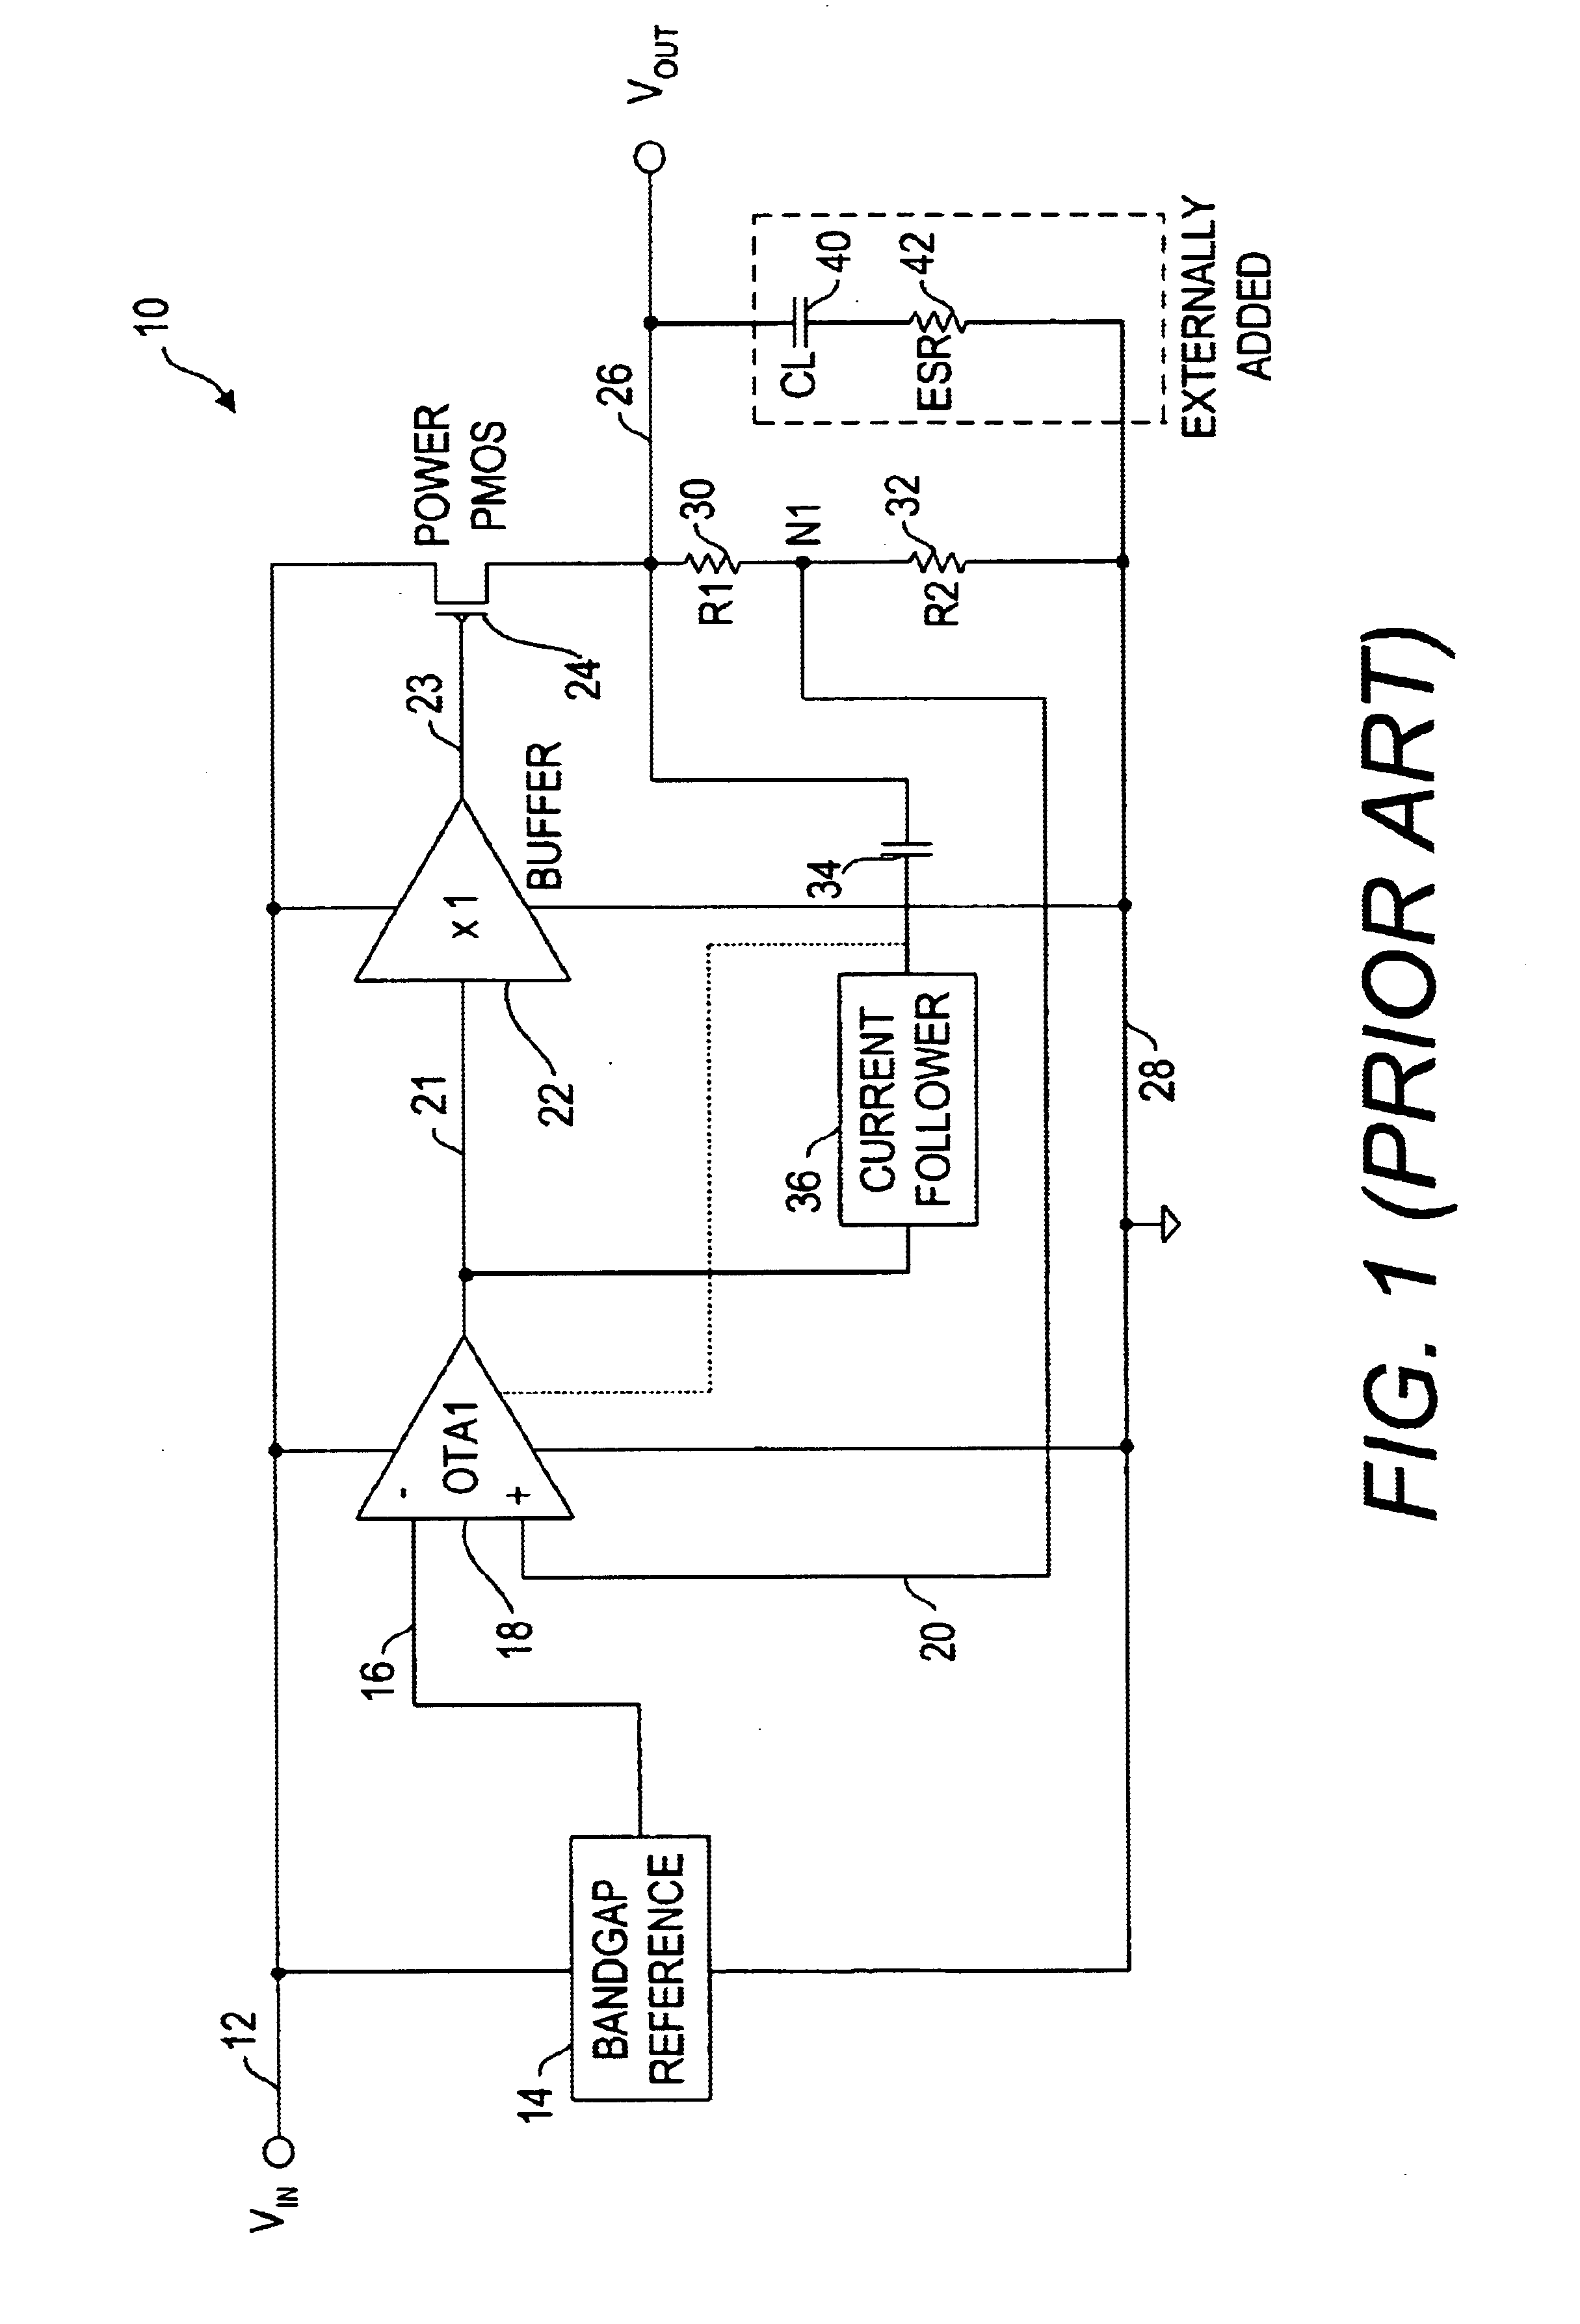 Dropout Voltage Drop Bustekhub 78265 Pro Circuit Tester From Hickok Waekon